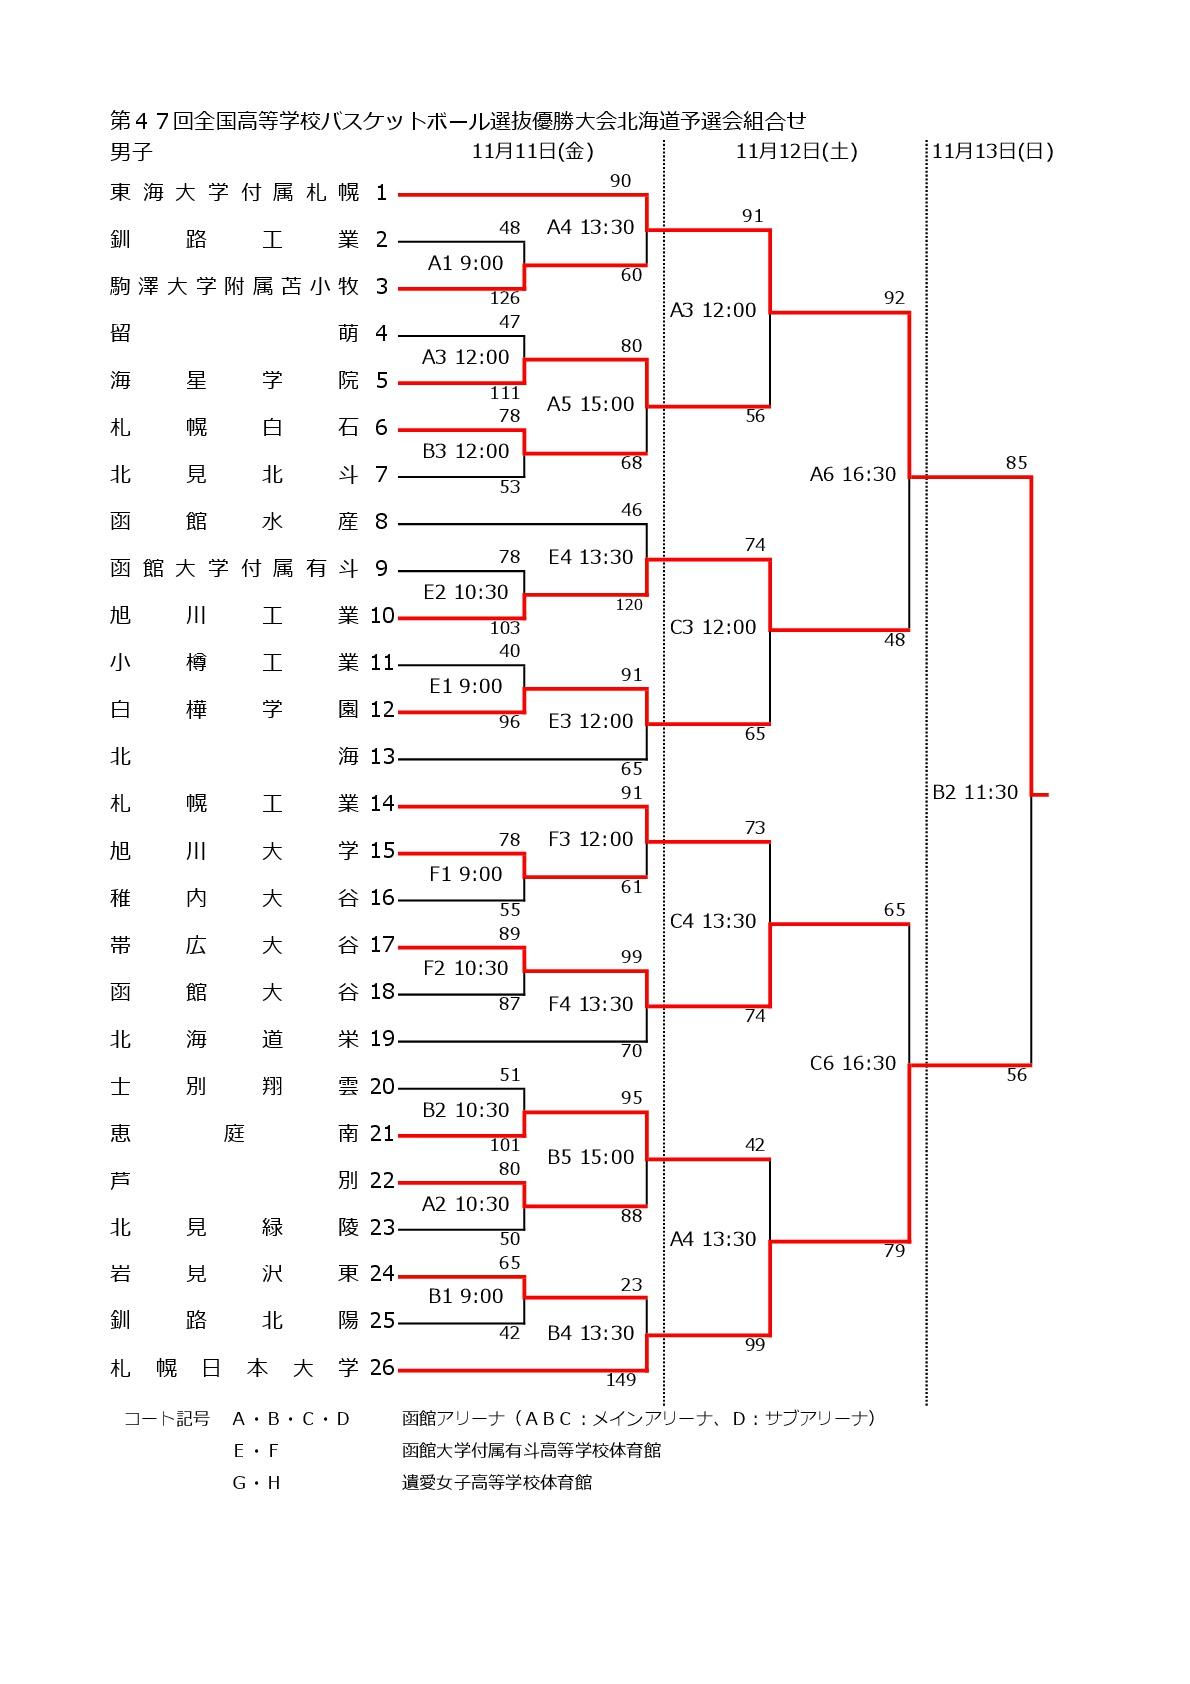 2016 basketball _senbatsu_man_results-001